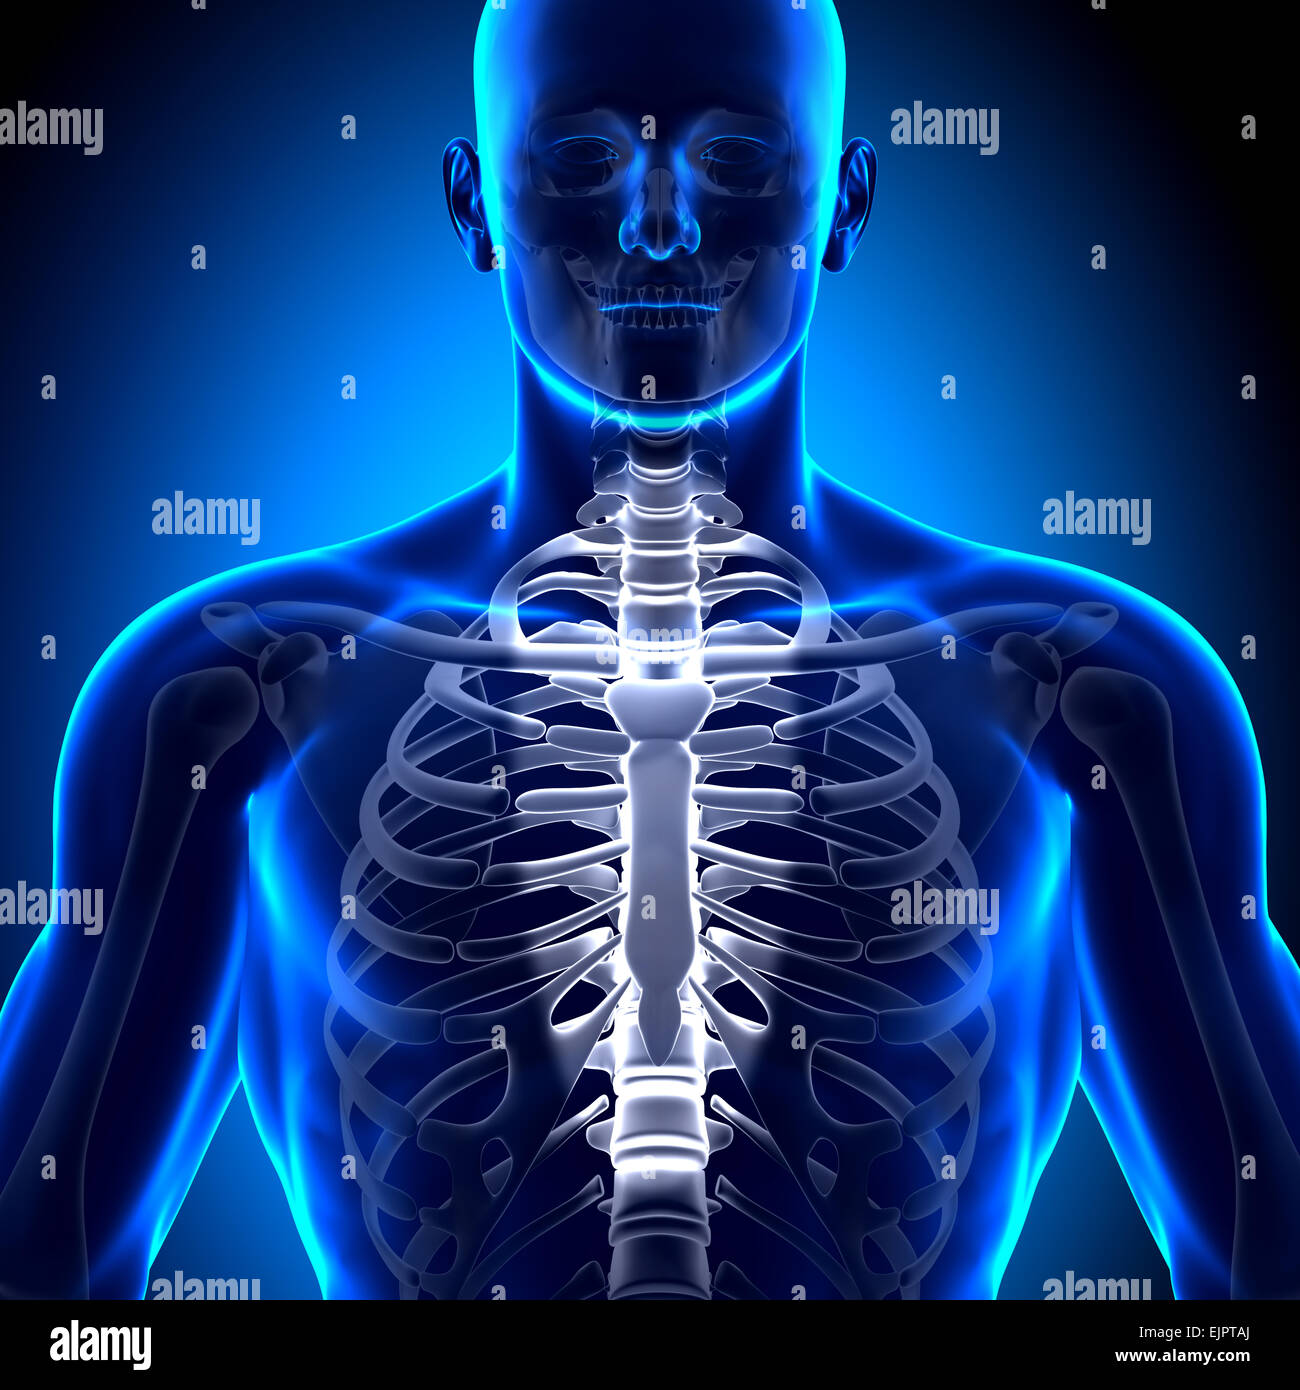 Male Rib Cage Sternum Anatomy Bones Stock Photo 80407338 Alamy